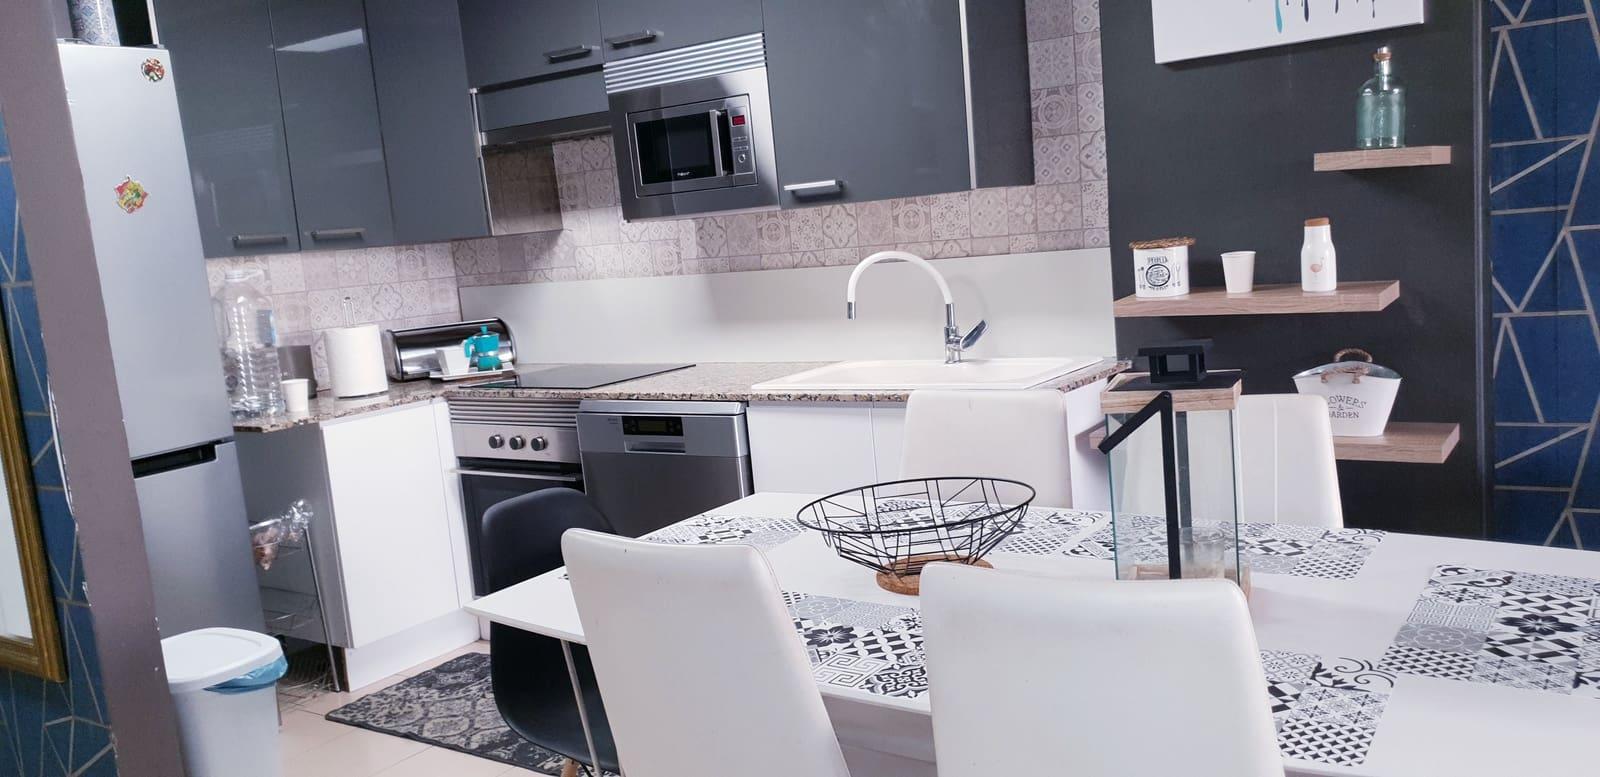 3 bedroom Apartment for sale in Arona - € 160,000 (Ref: 6315070)